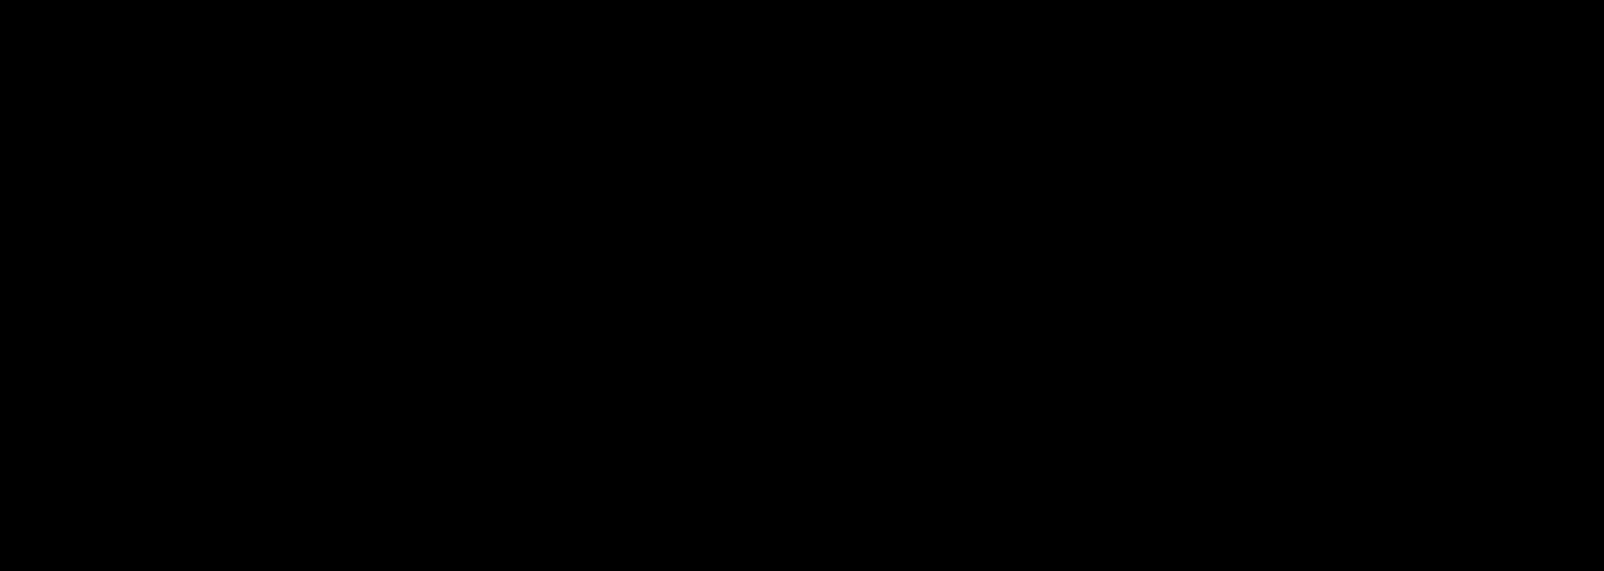 Bisphenol A Bis(2,3-dihydroxypropyl) Ether